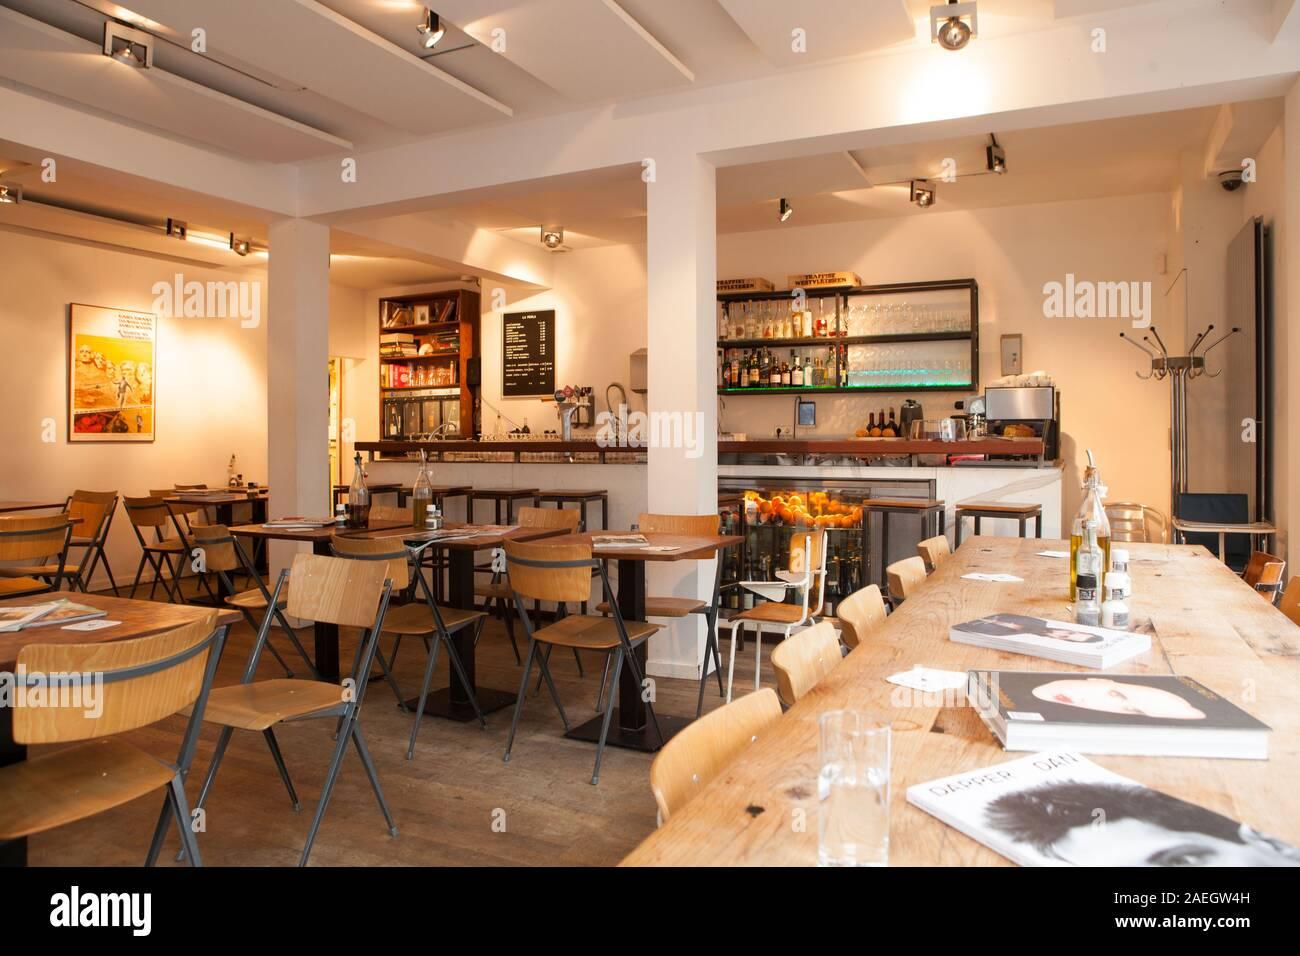 Digital Izar entidad  La Perla Restaurant High Resolution Stock Photography and Images - Alamy